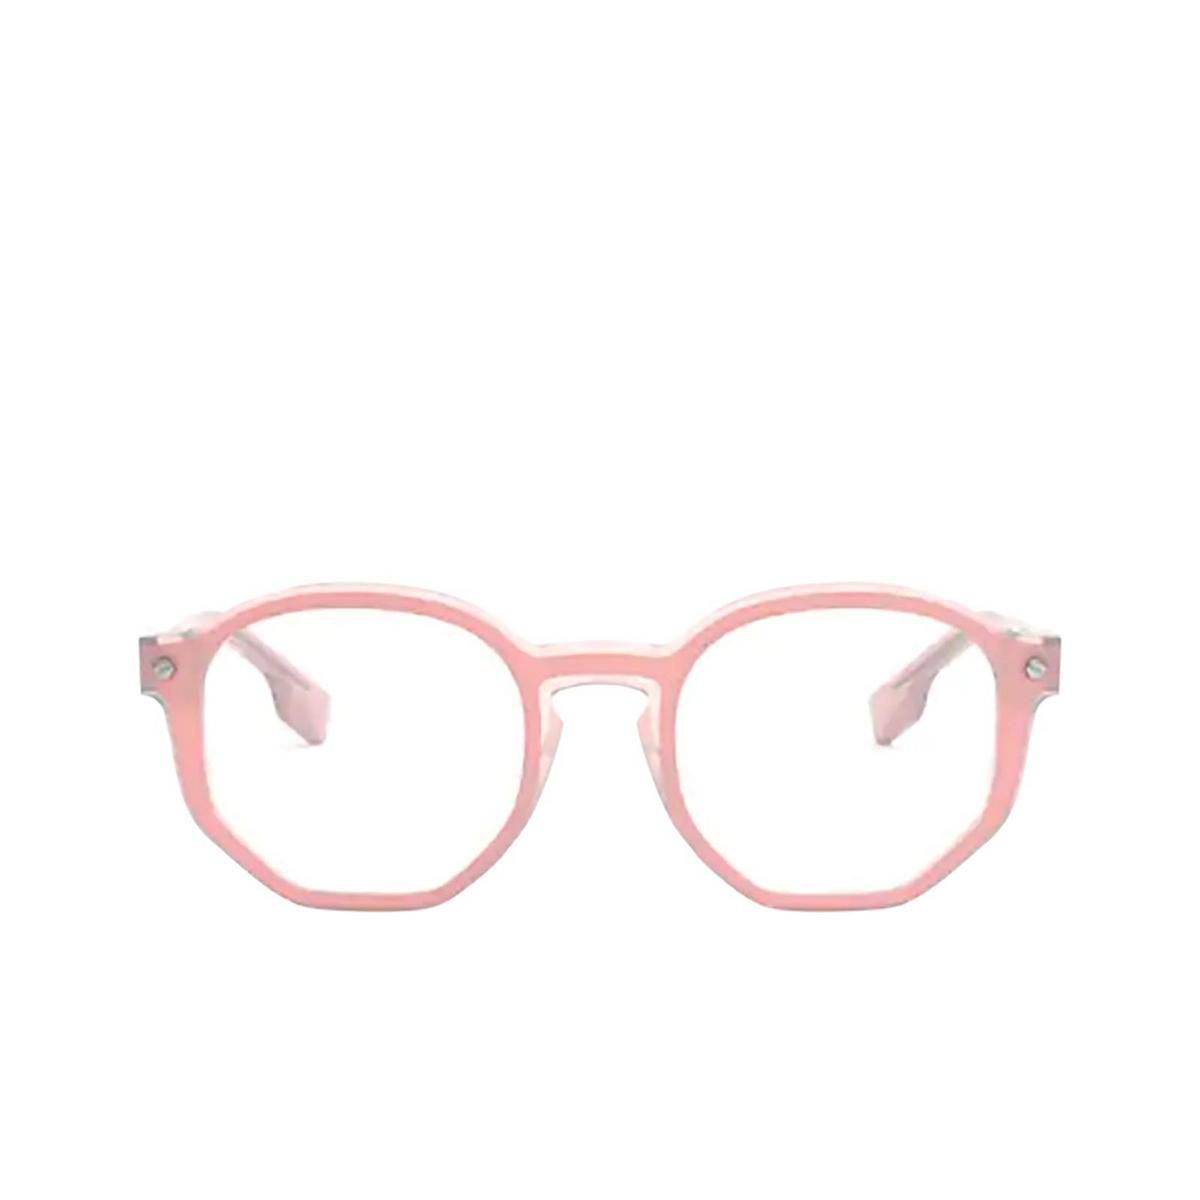 Burberry® Irregular Eyeglasses: Hogarth BE2317 color Top Opal Pink On Pink Transparent 3847 - front view.